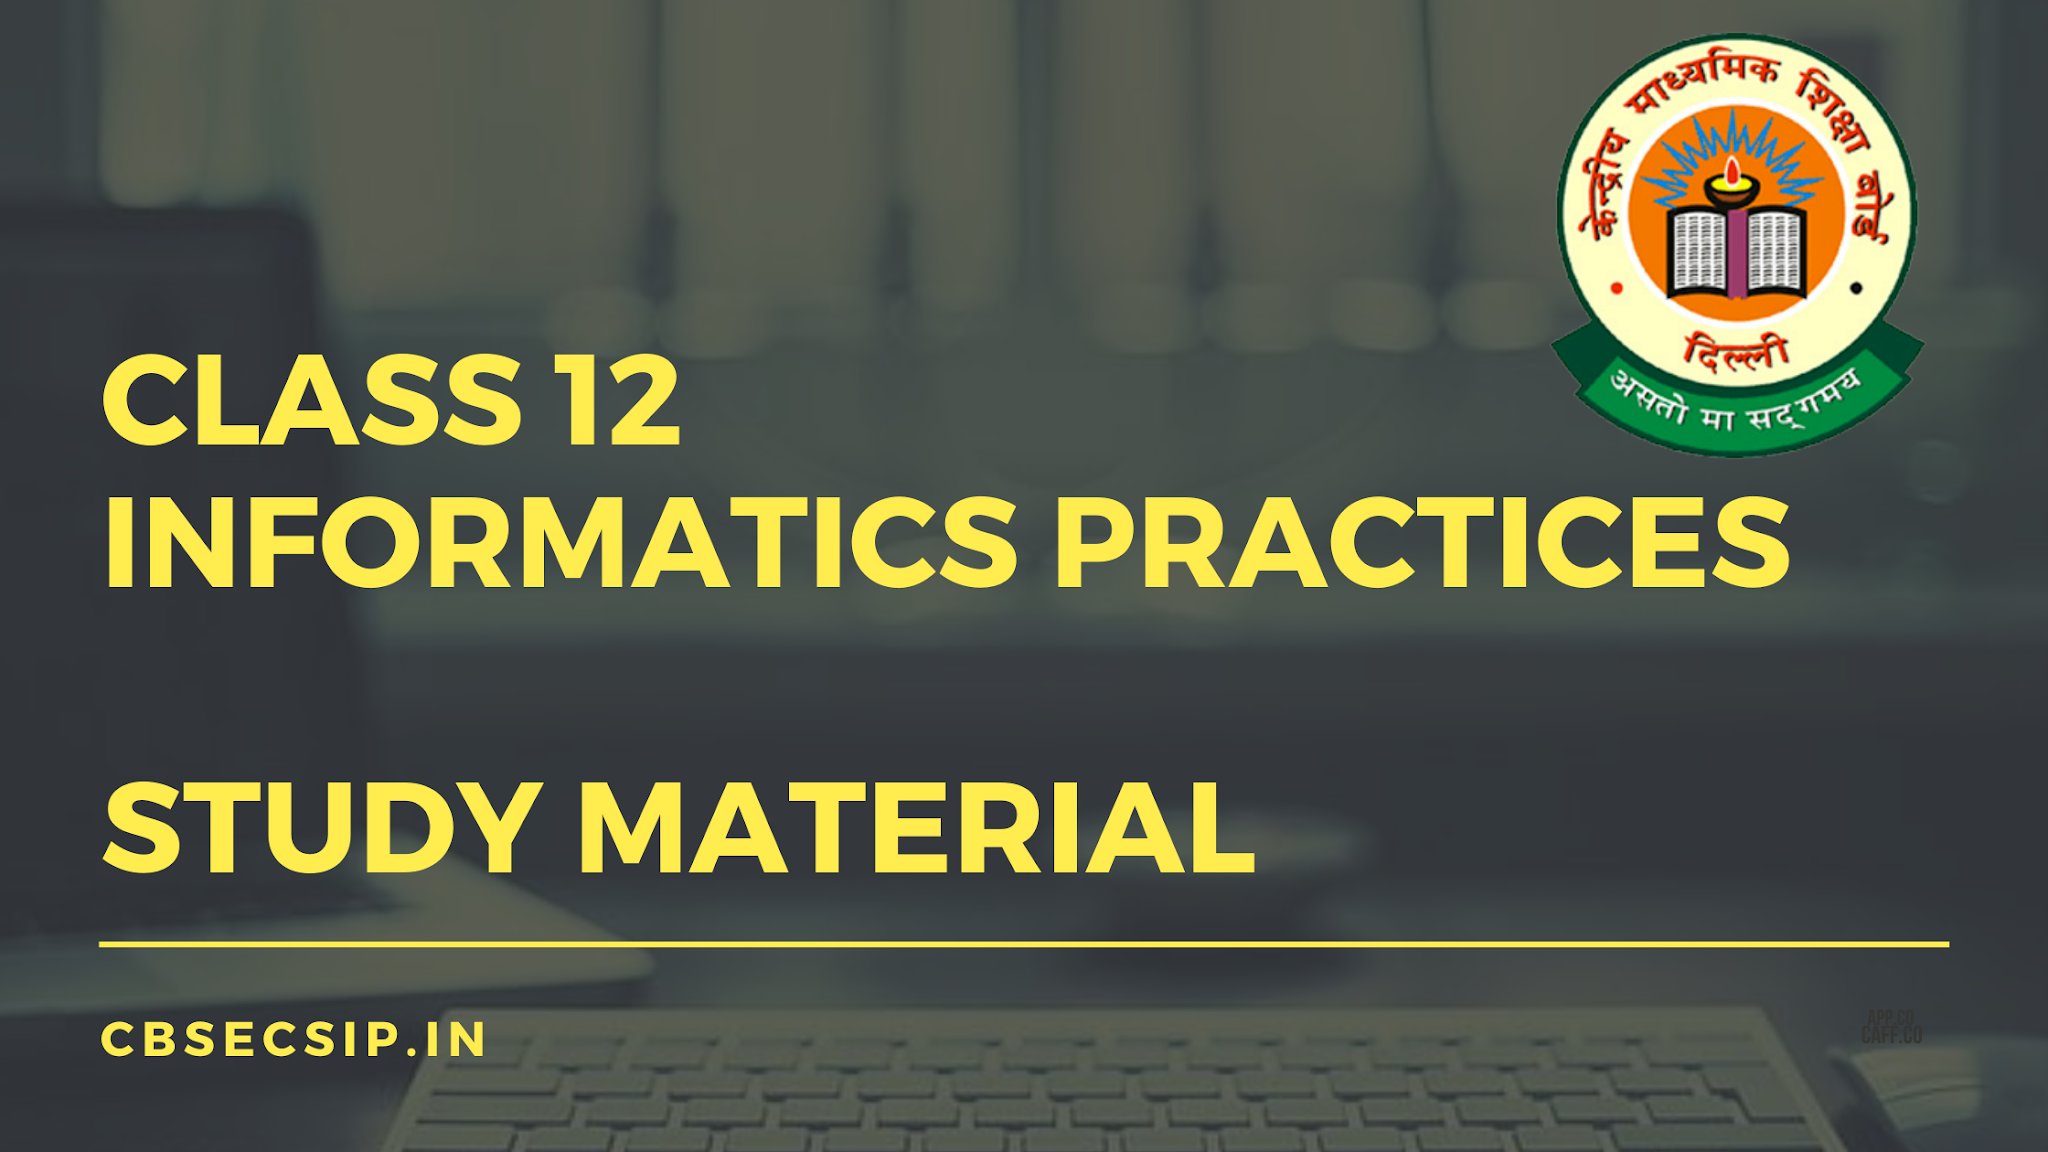 CLASS 12 INFORMATICS PRACTICES STUDY MATERIAL